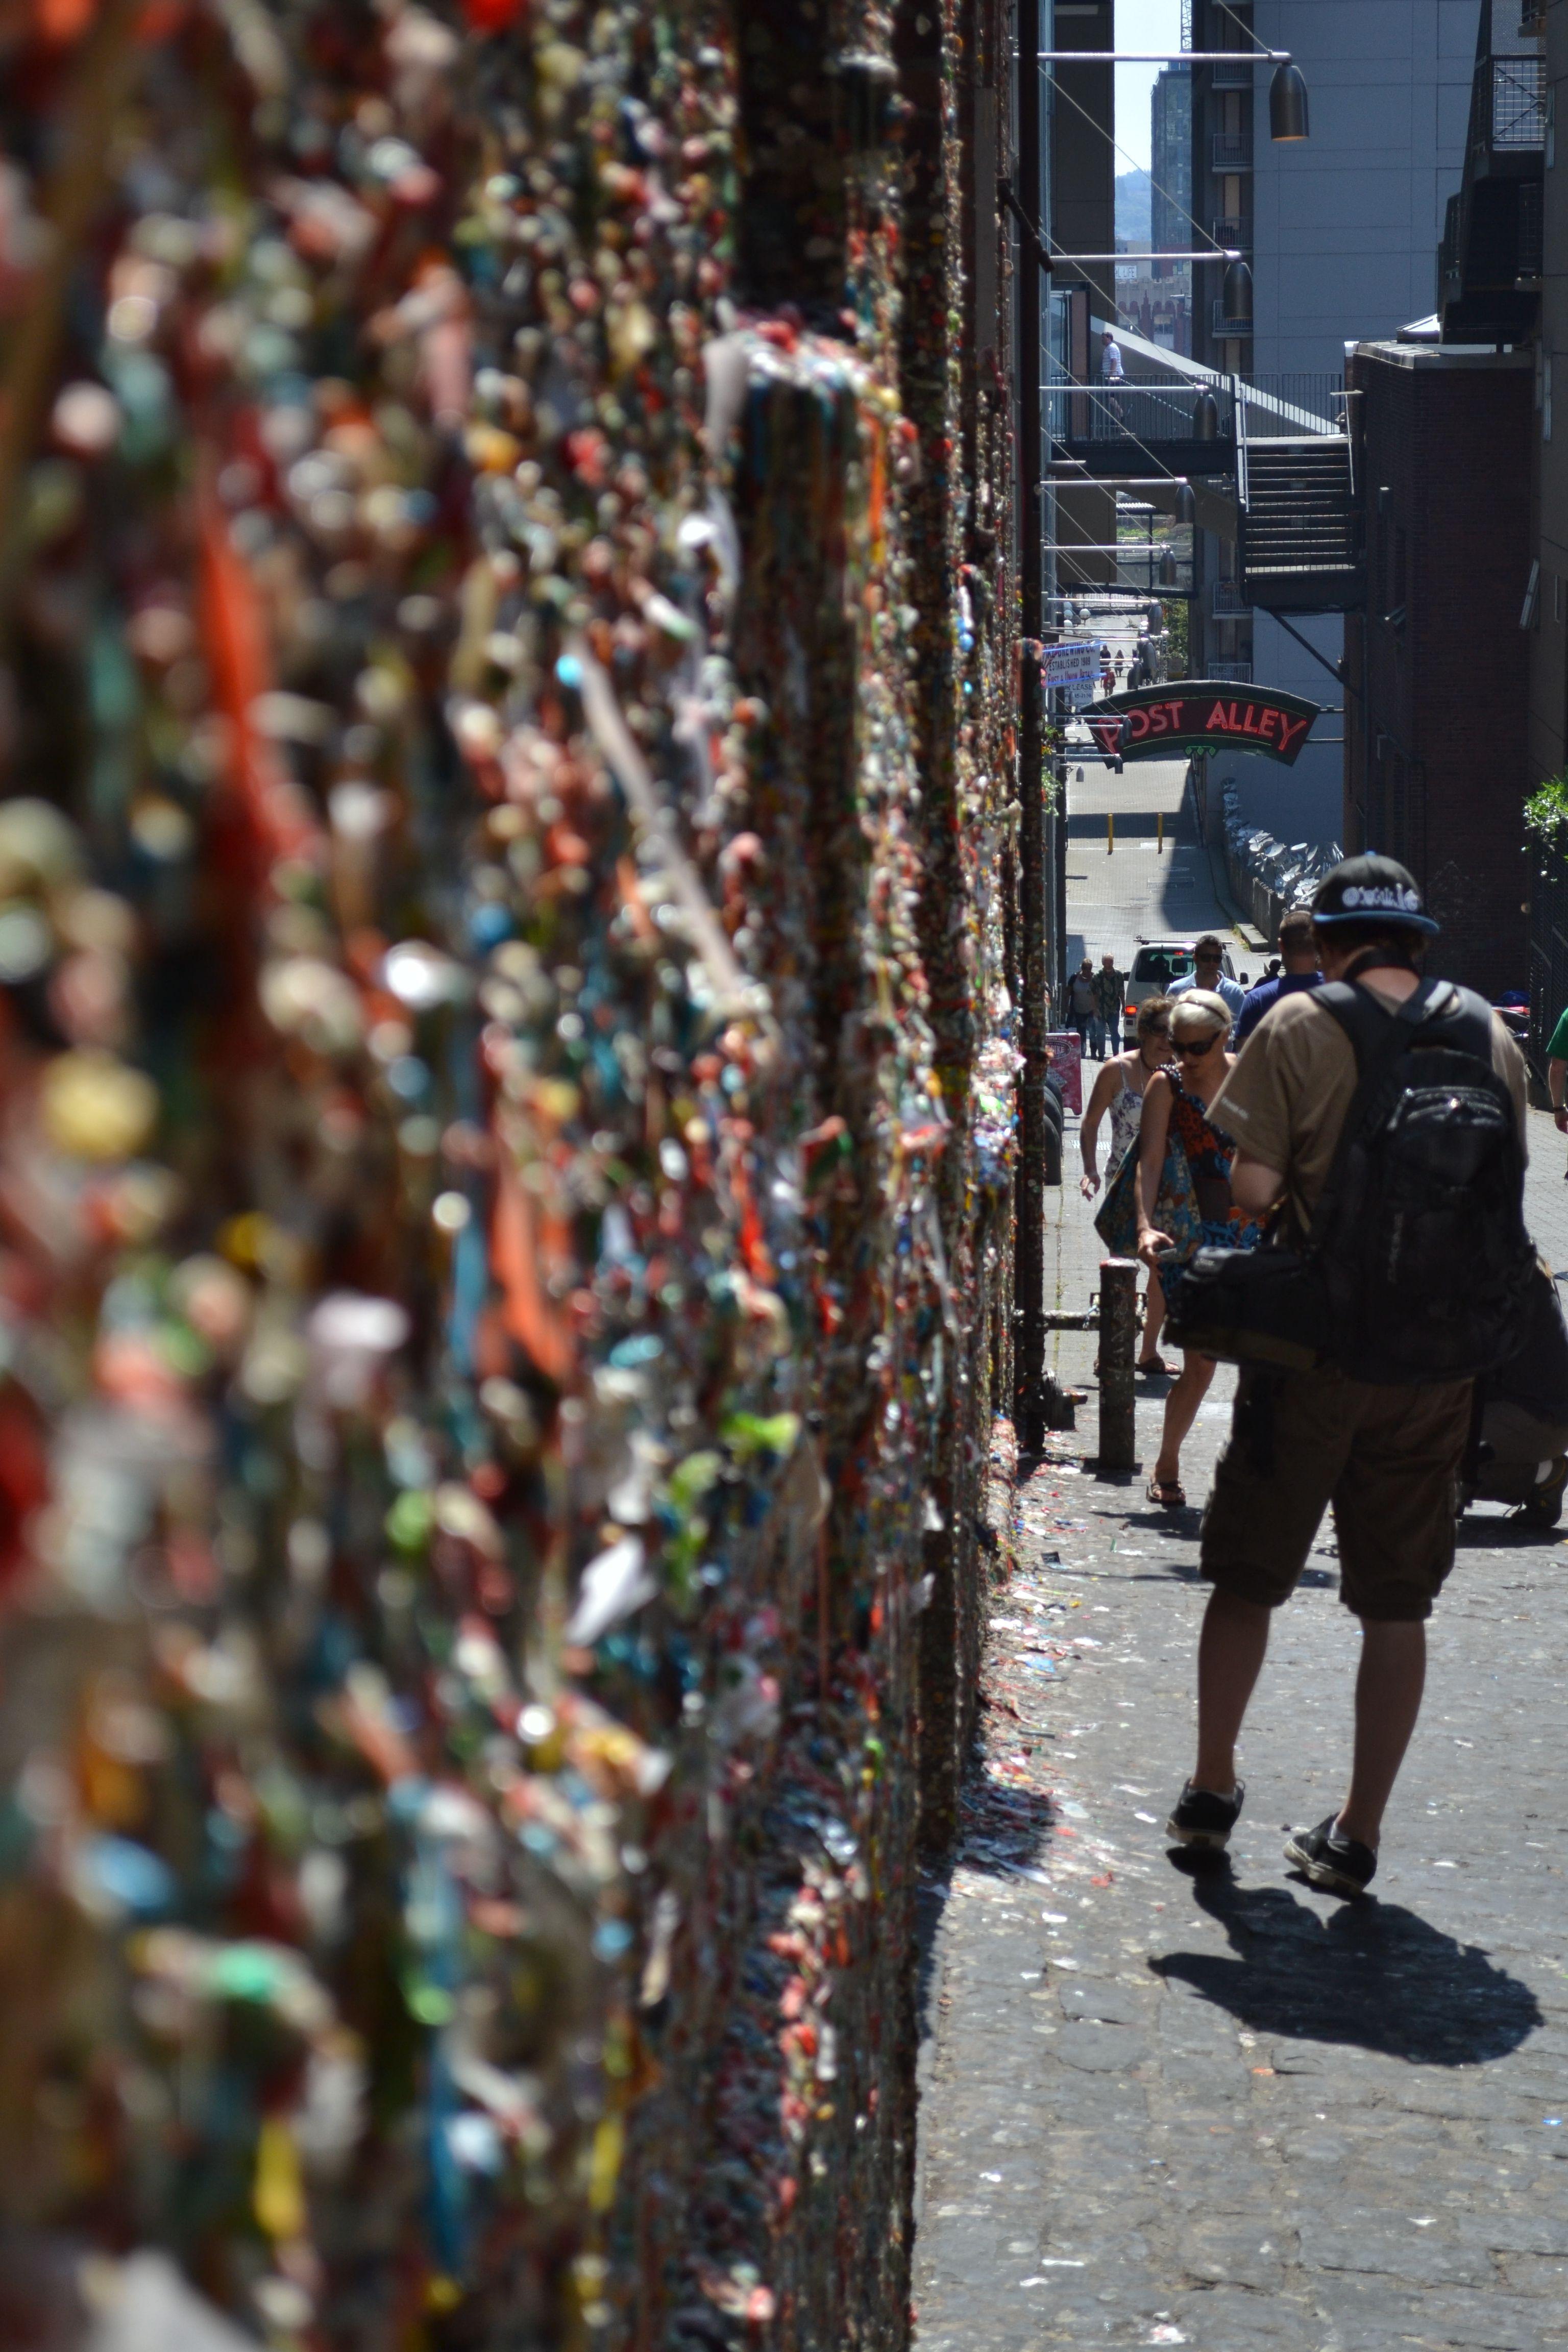 """gum wall"" in Post Alley, Seattle, WA"